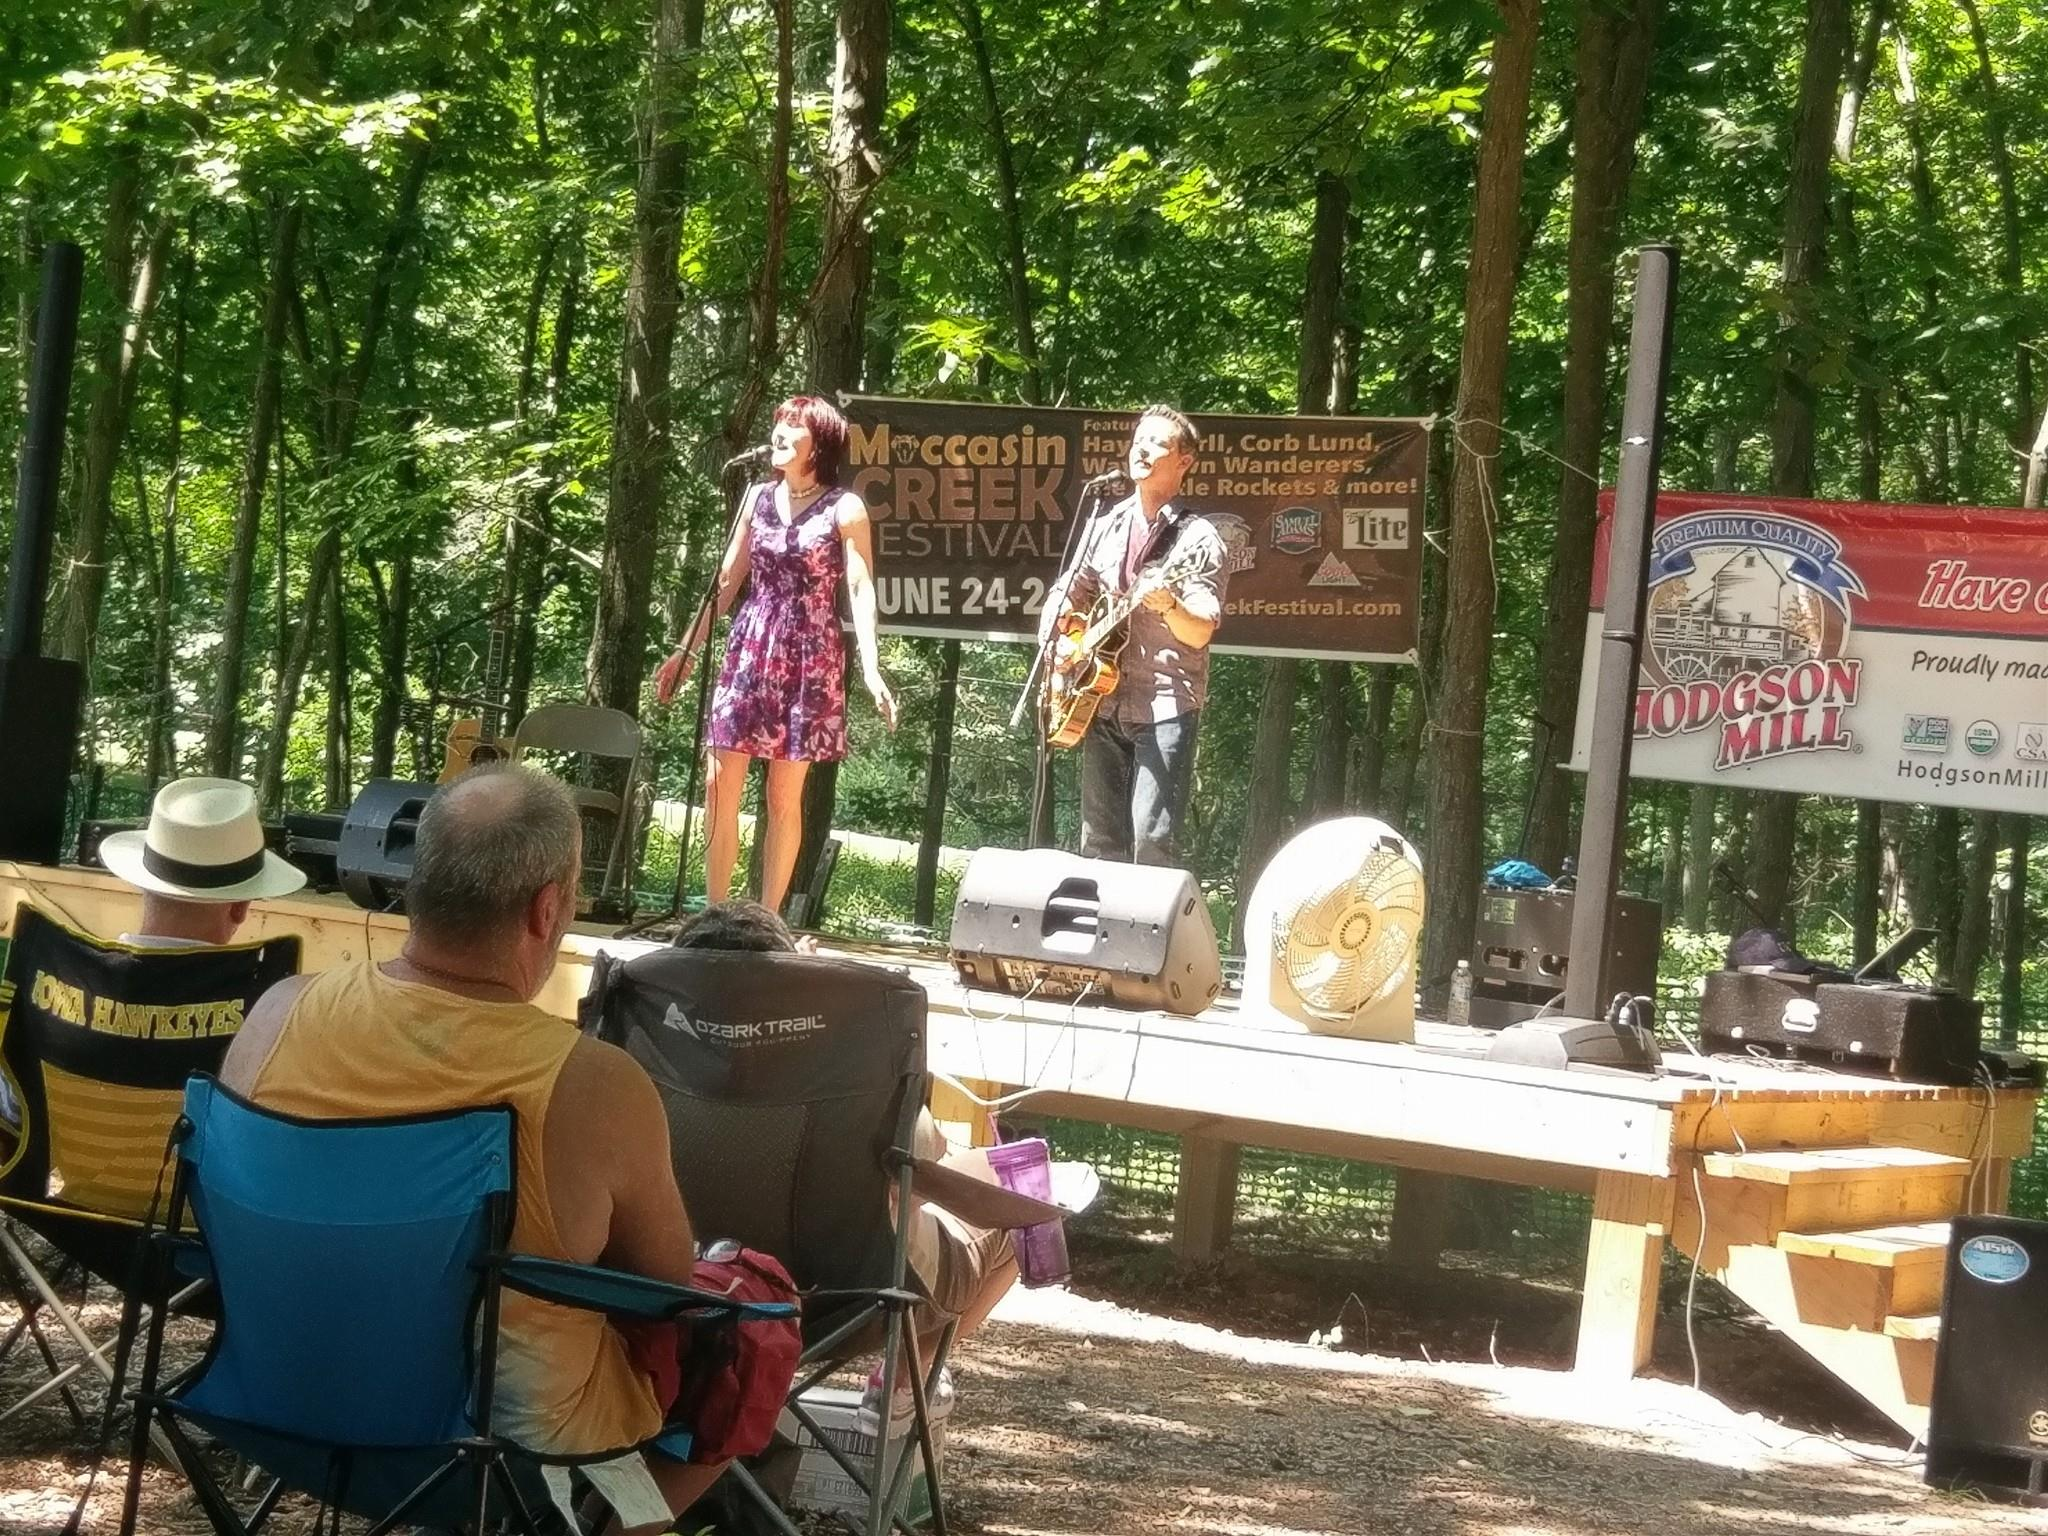 Moccasin Creek Festival 2016